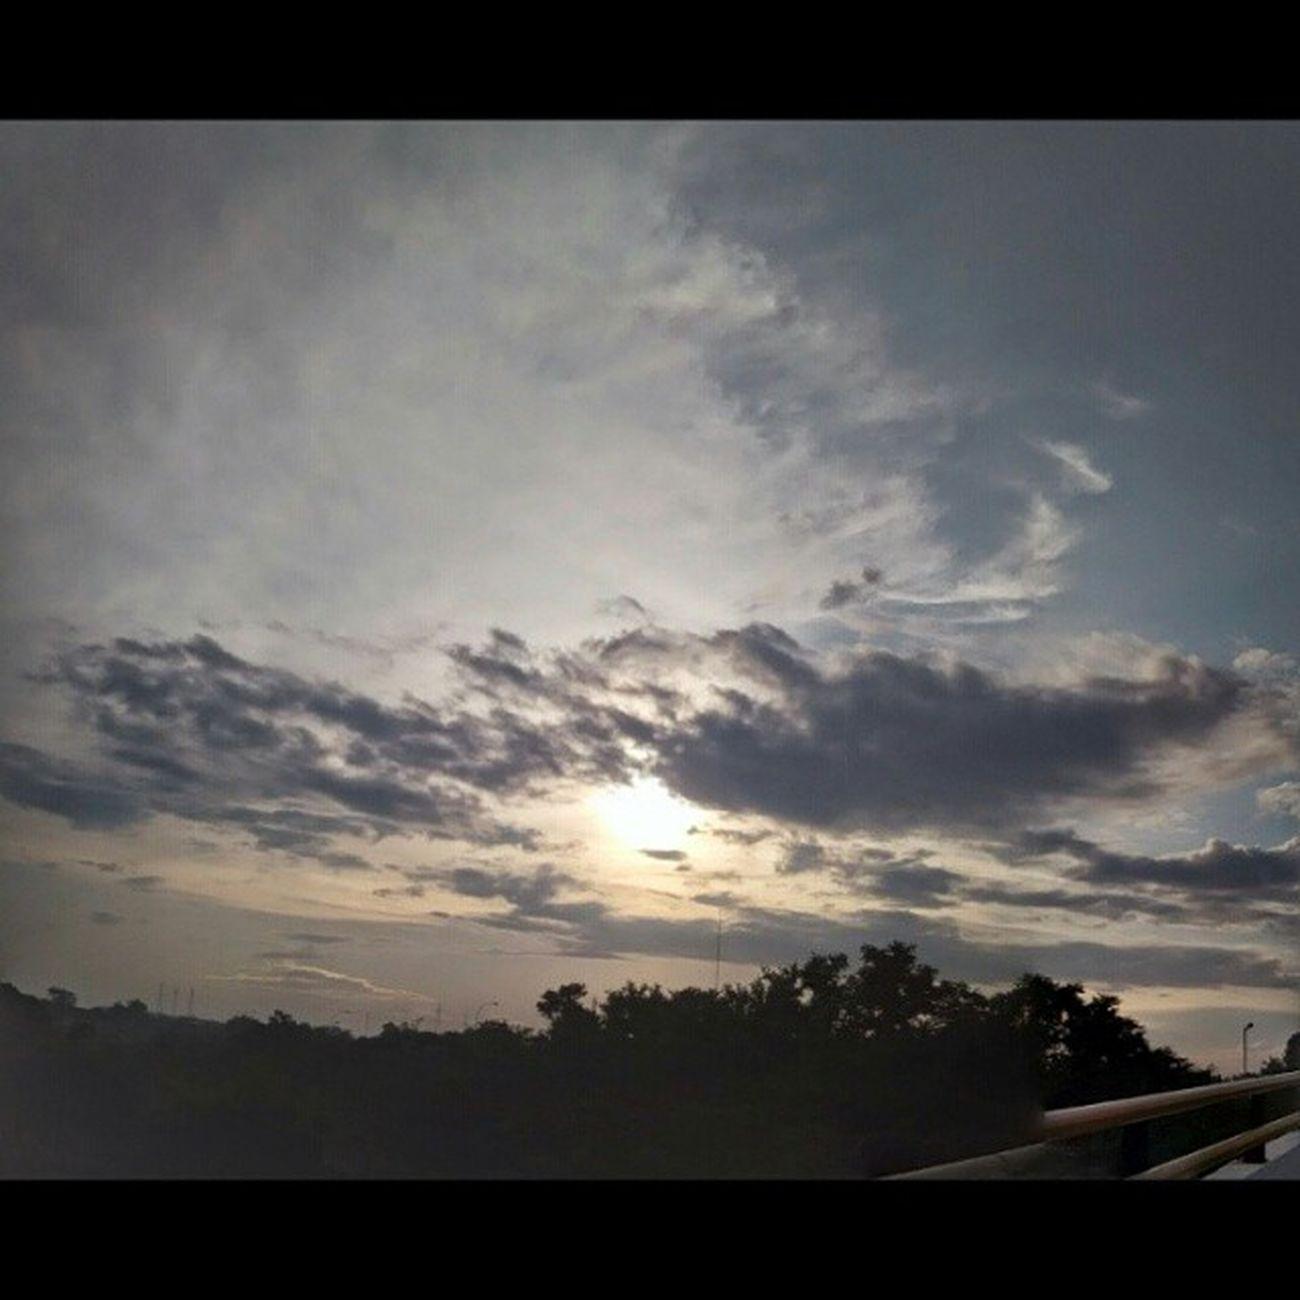 Di fly over jurang mangu Likeforlike Latepost Instalike Berkah Instagood Instagallery Insta Sunset Sky Cloudy Weneedwedo Semogakausuka OKE Jurangmangu Stasiun Flyover Matahari Byphone CameraHp The Great Outdoors - 2016 EyeEm Awards